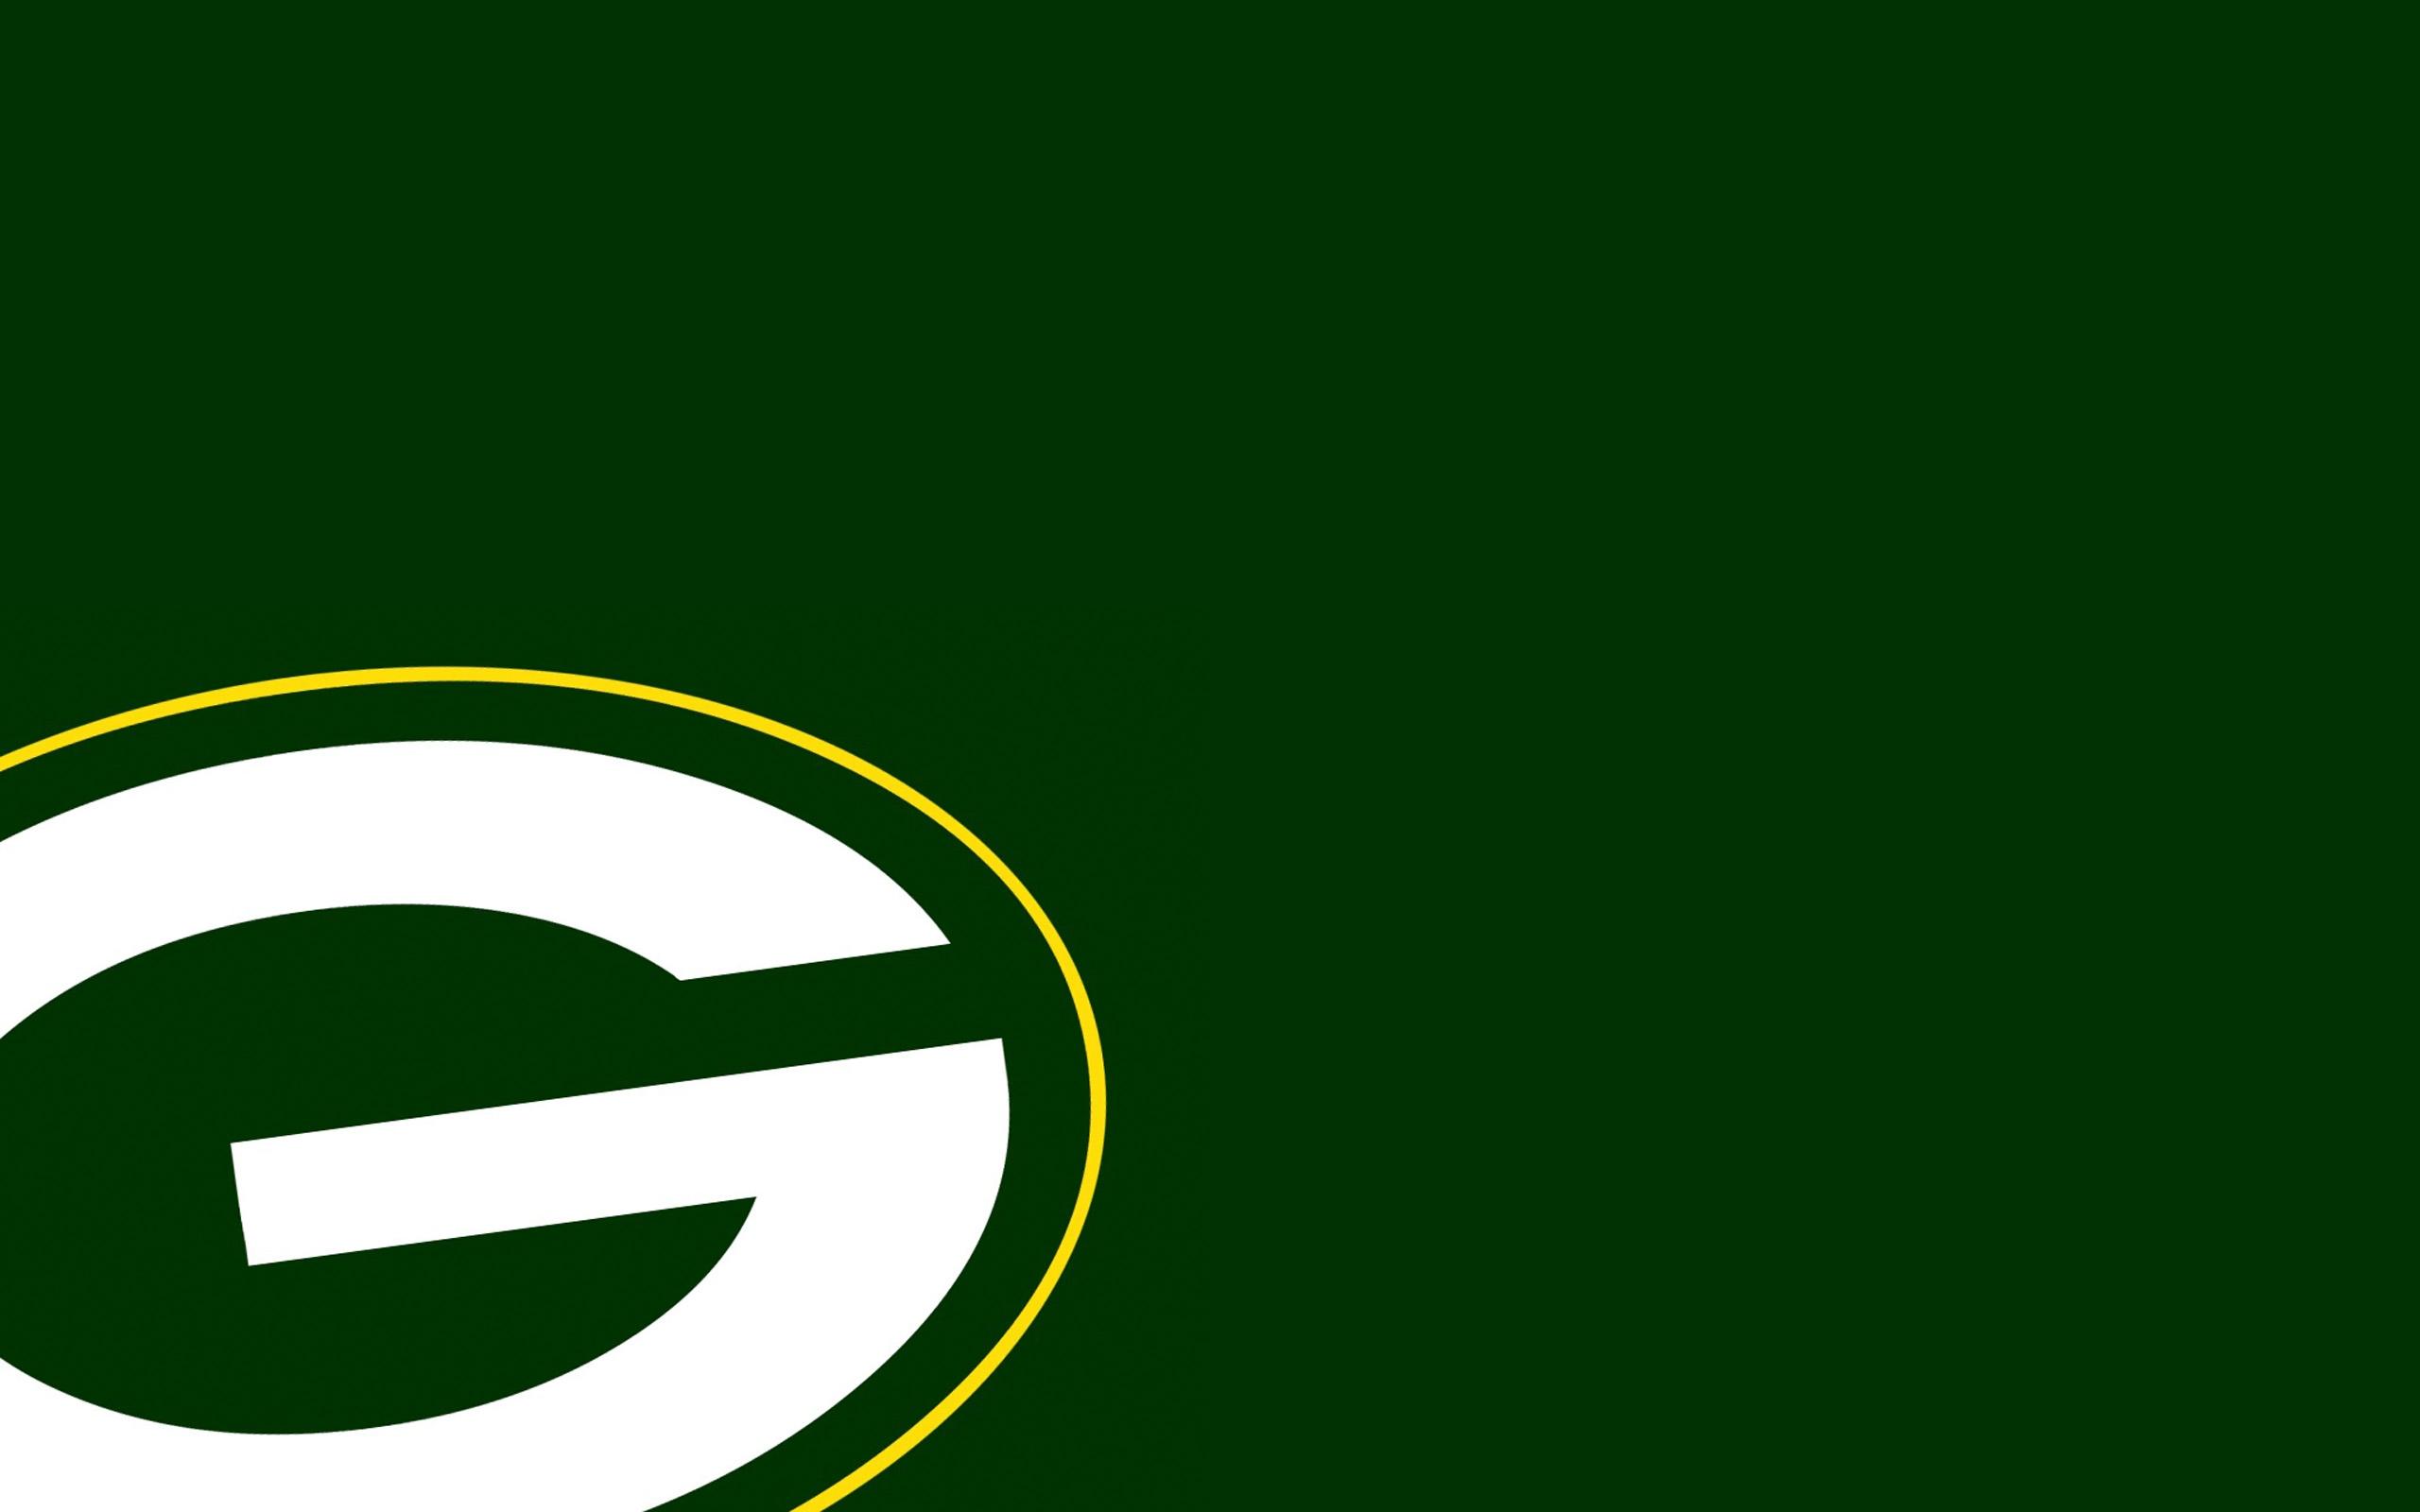 Packers Wallpaper 2560x1600 54125